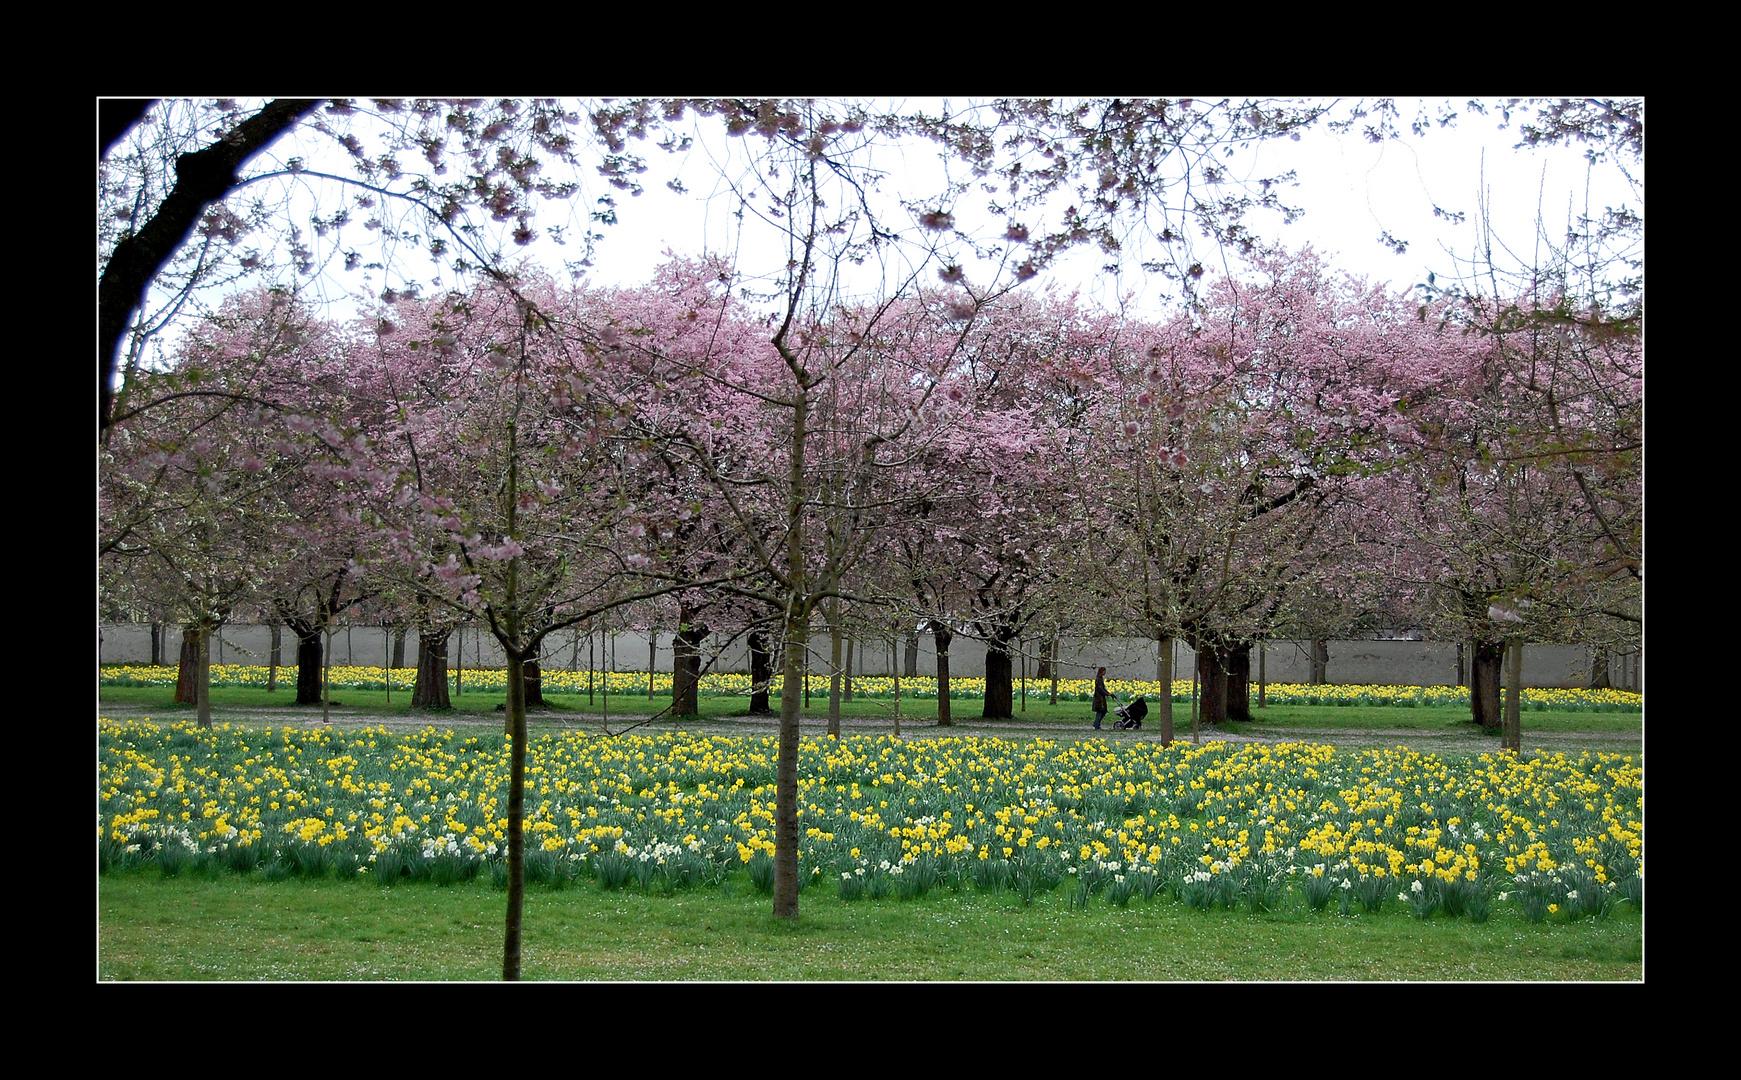 Frühlingsmorgen im Schlosspark - Nr. 1